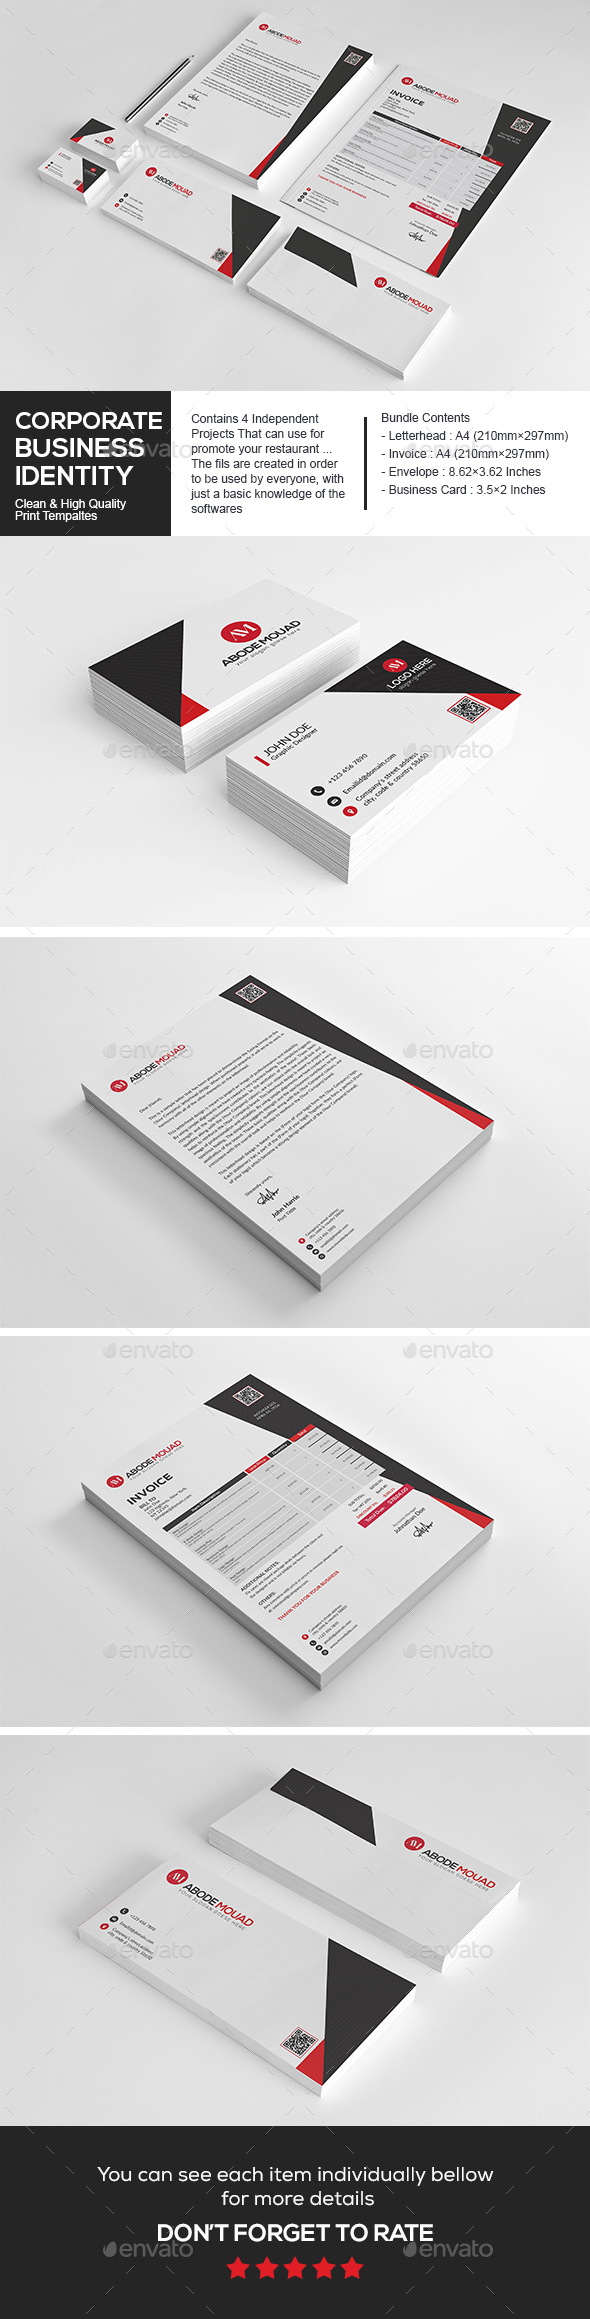 GraphicRiver Corporate Business Identity 21150568